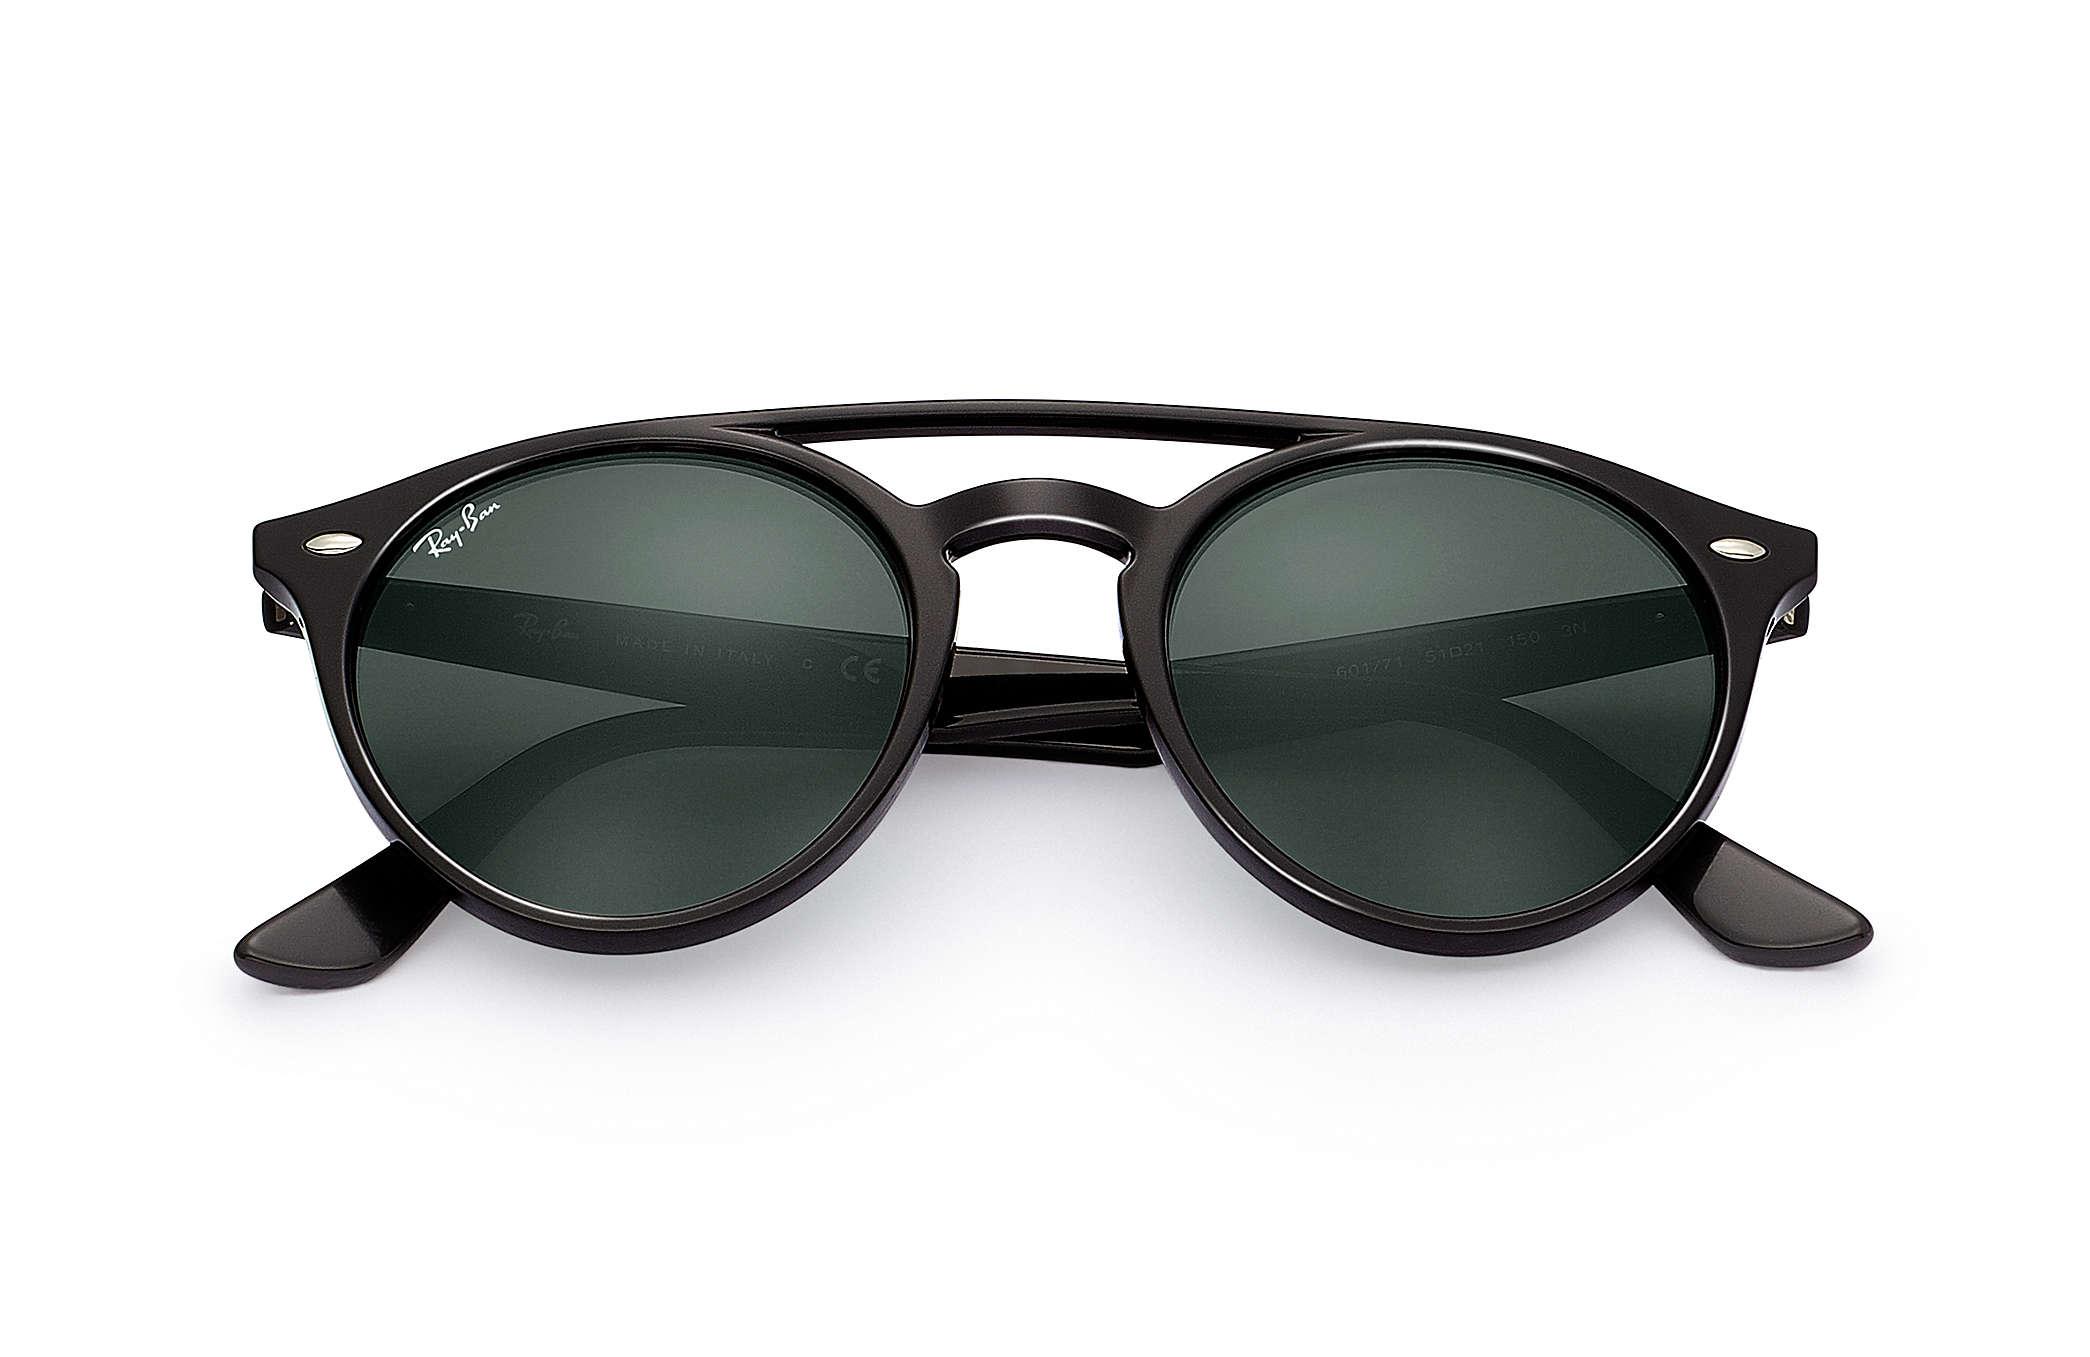 Ray-Ban RB4279 Black - Propionate - Green Lenses - 0RB4279601 7151 ... a4c3f5b0ff